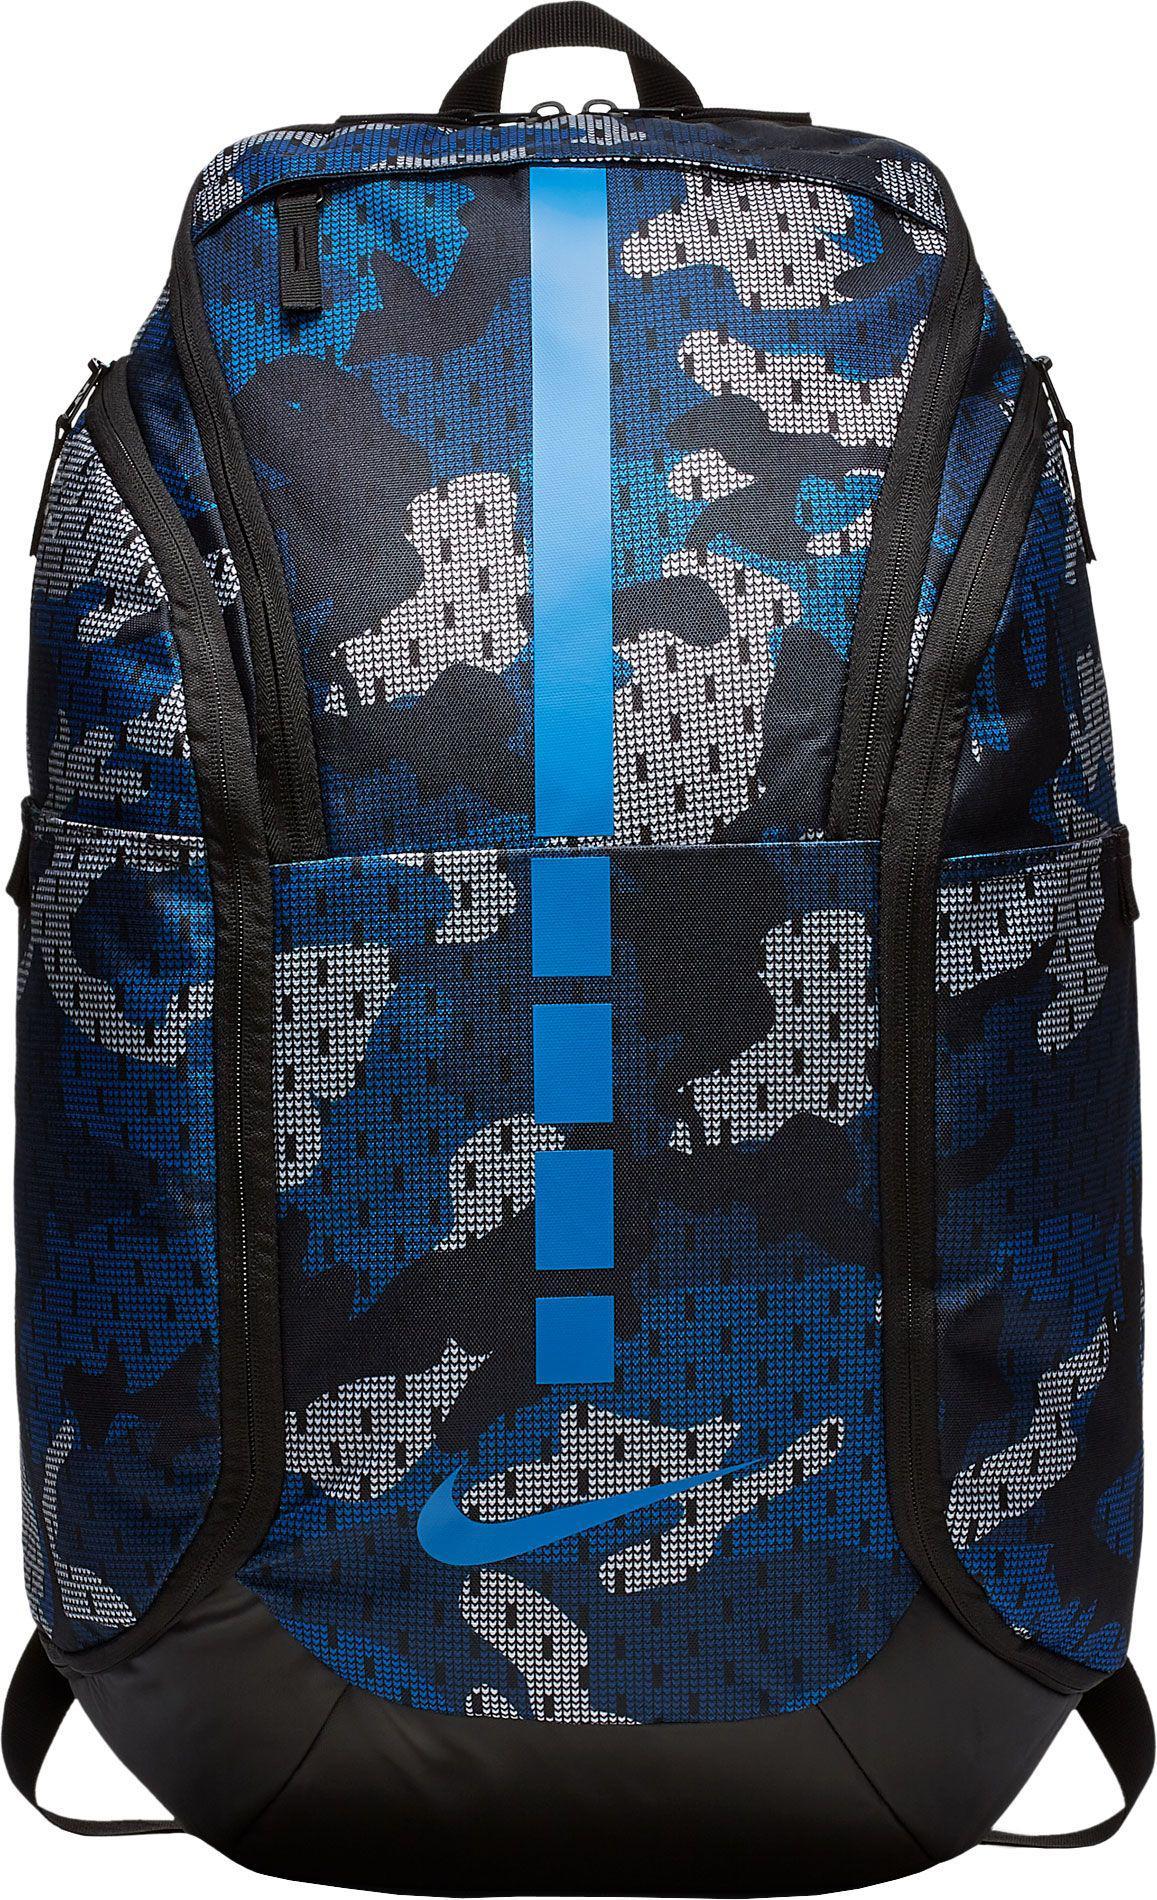 Lyst - Nike Hoops Elite Pro Camo Basketball Backpack in Blue for Men c495bdd5741b5